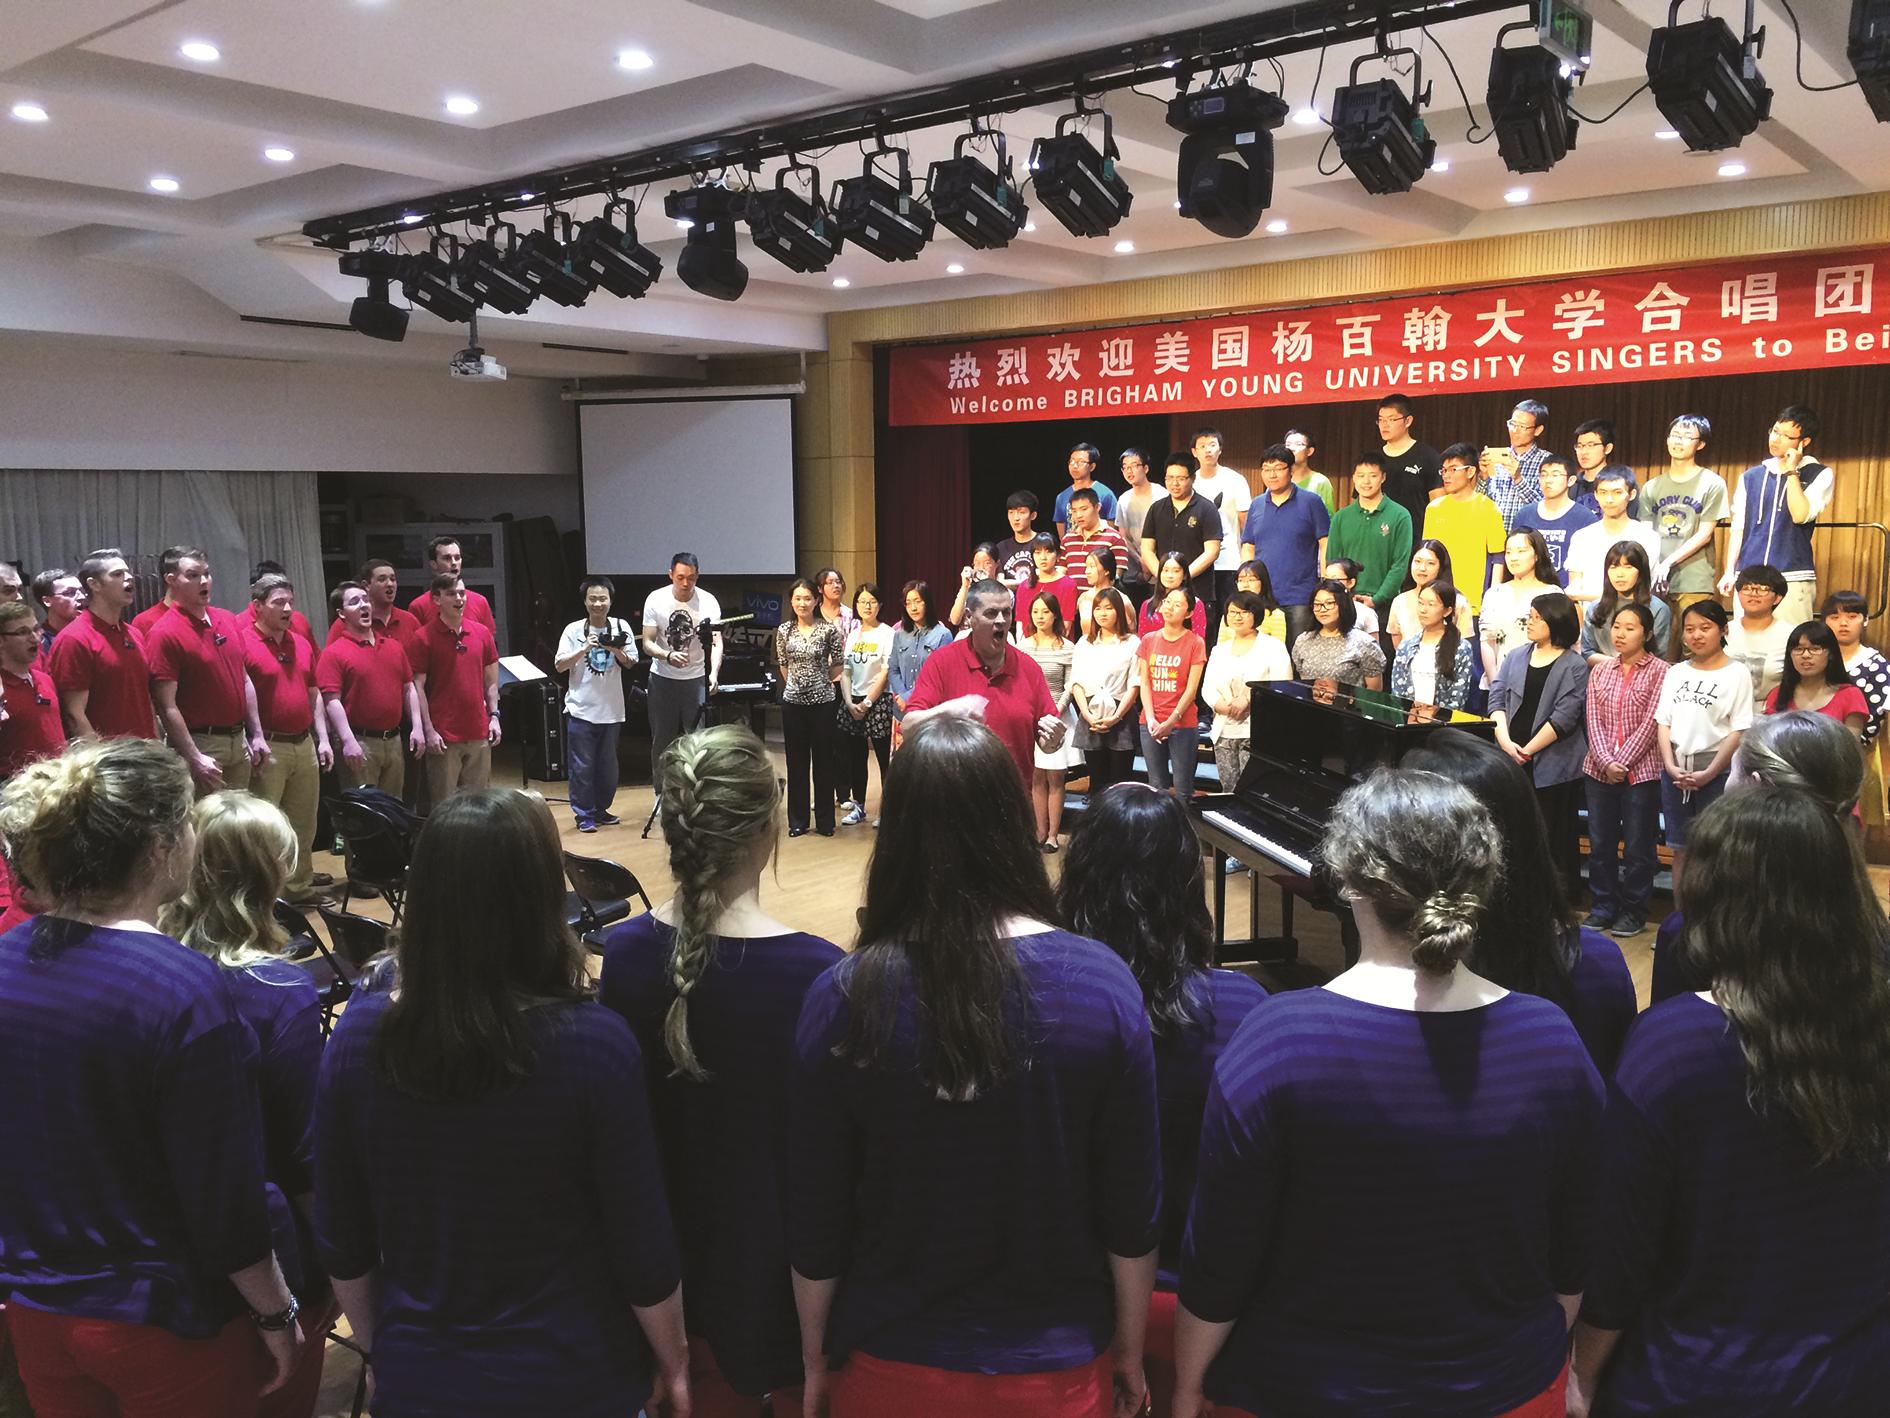 https://pam.byu.edu/wp-content/uploads/2015/11/Apr-30-Beijing-Beihang-Univ-workshop-1.jpeg-copySWOP.png